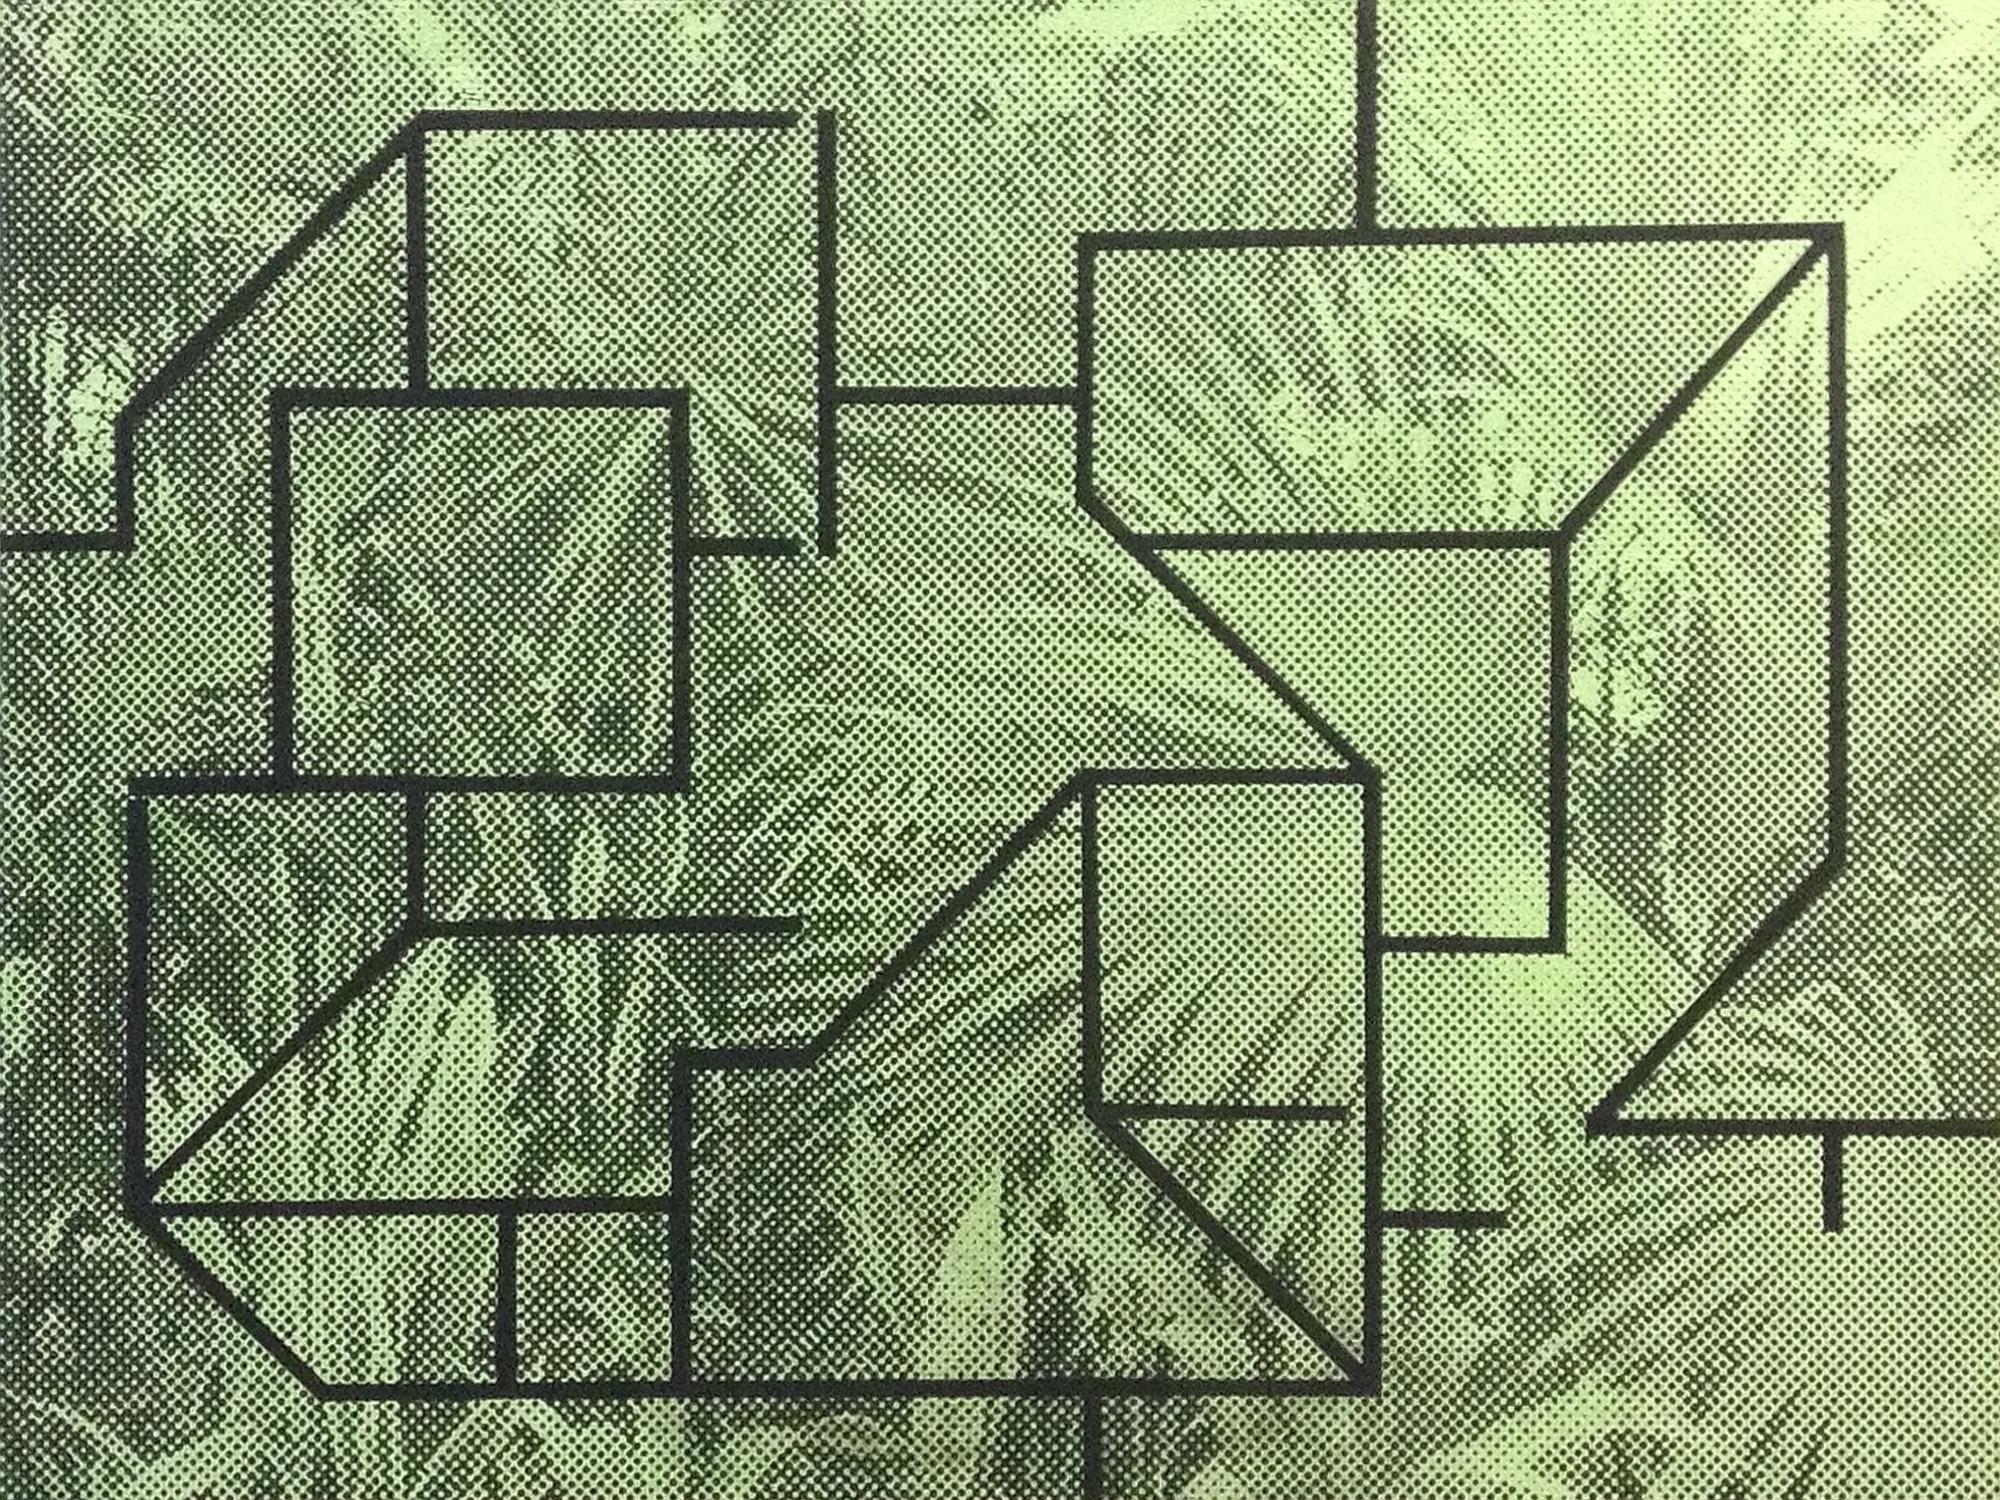 Spatialization (ˌspeɪʃəlaɪˈzeɪʃ - marcandrejodoin | ello